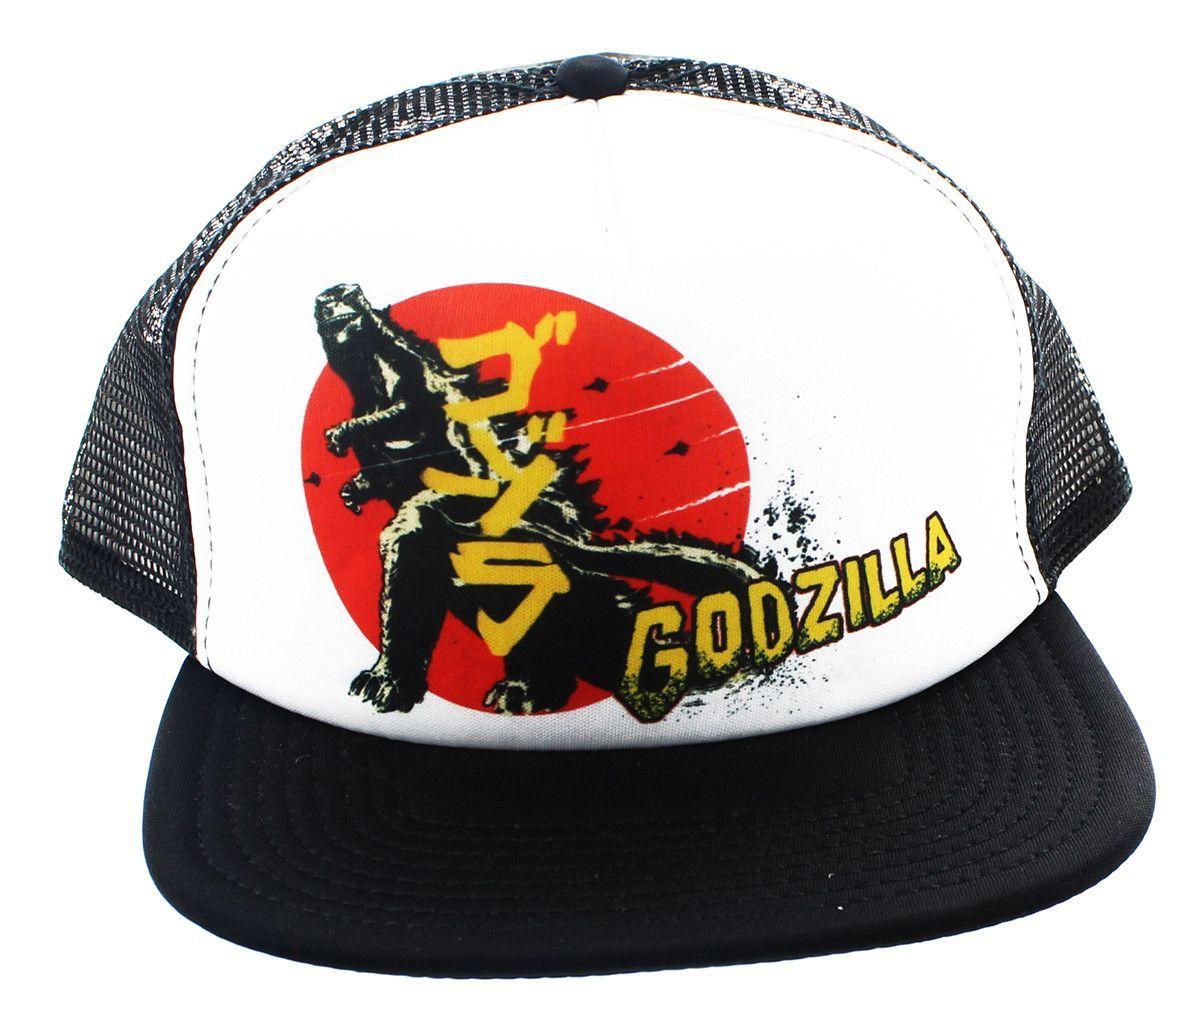 81830027c Godzilla Sub Print Trucker Cap | Hats | Godzilla, Cap, Baseball cap